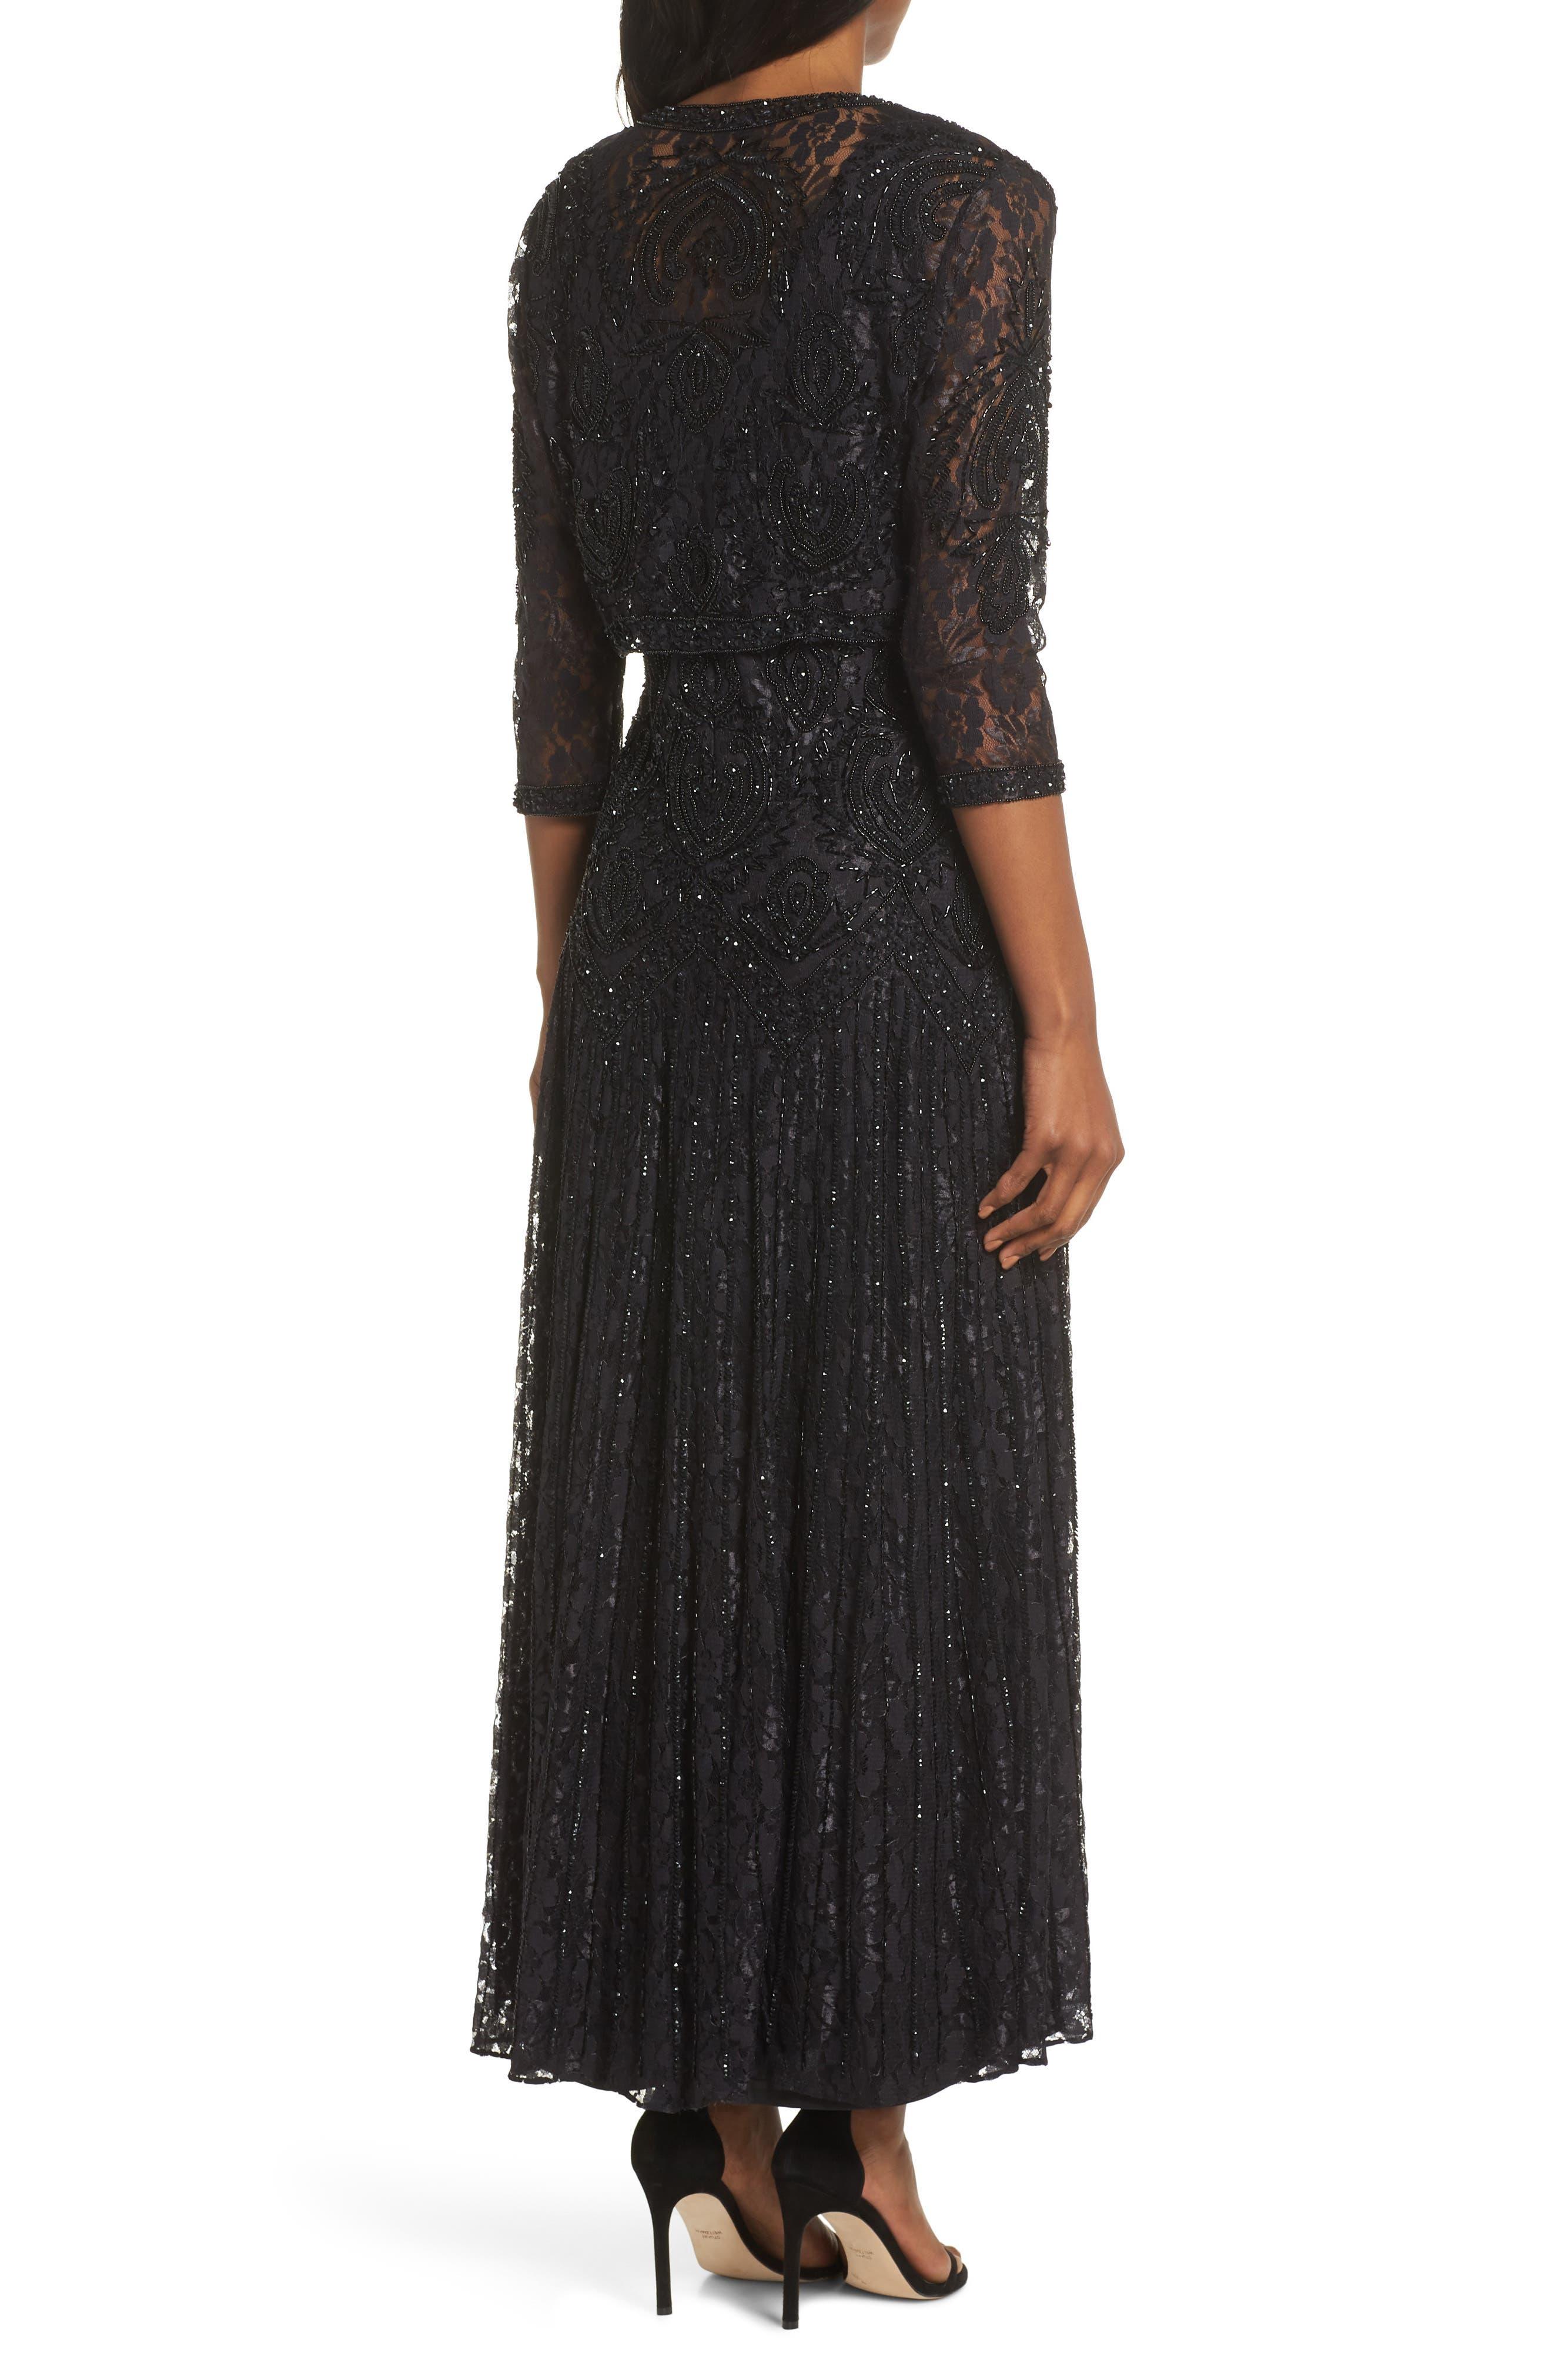 PISARRO NIGHTS, Beaded Lace Evening Dress with Bolero, Alternate thumbnail 2, color, BLACK